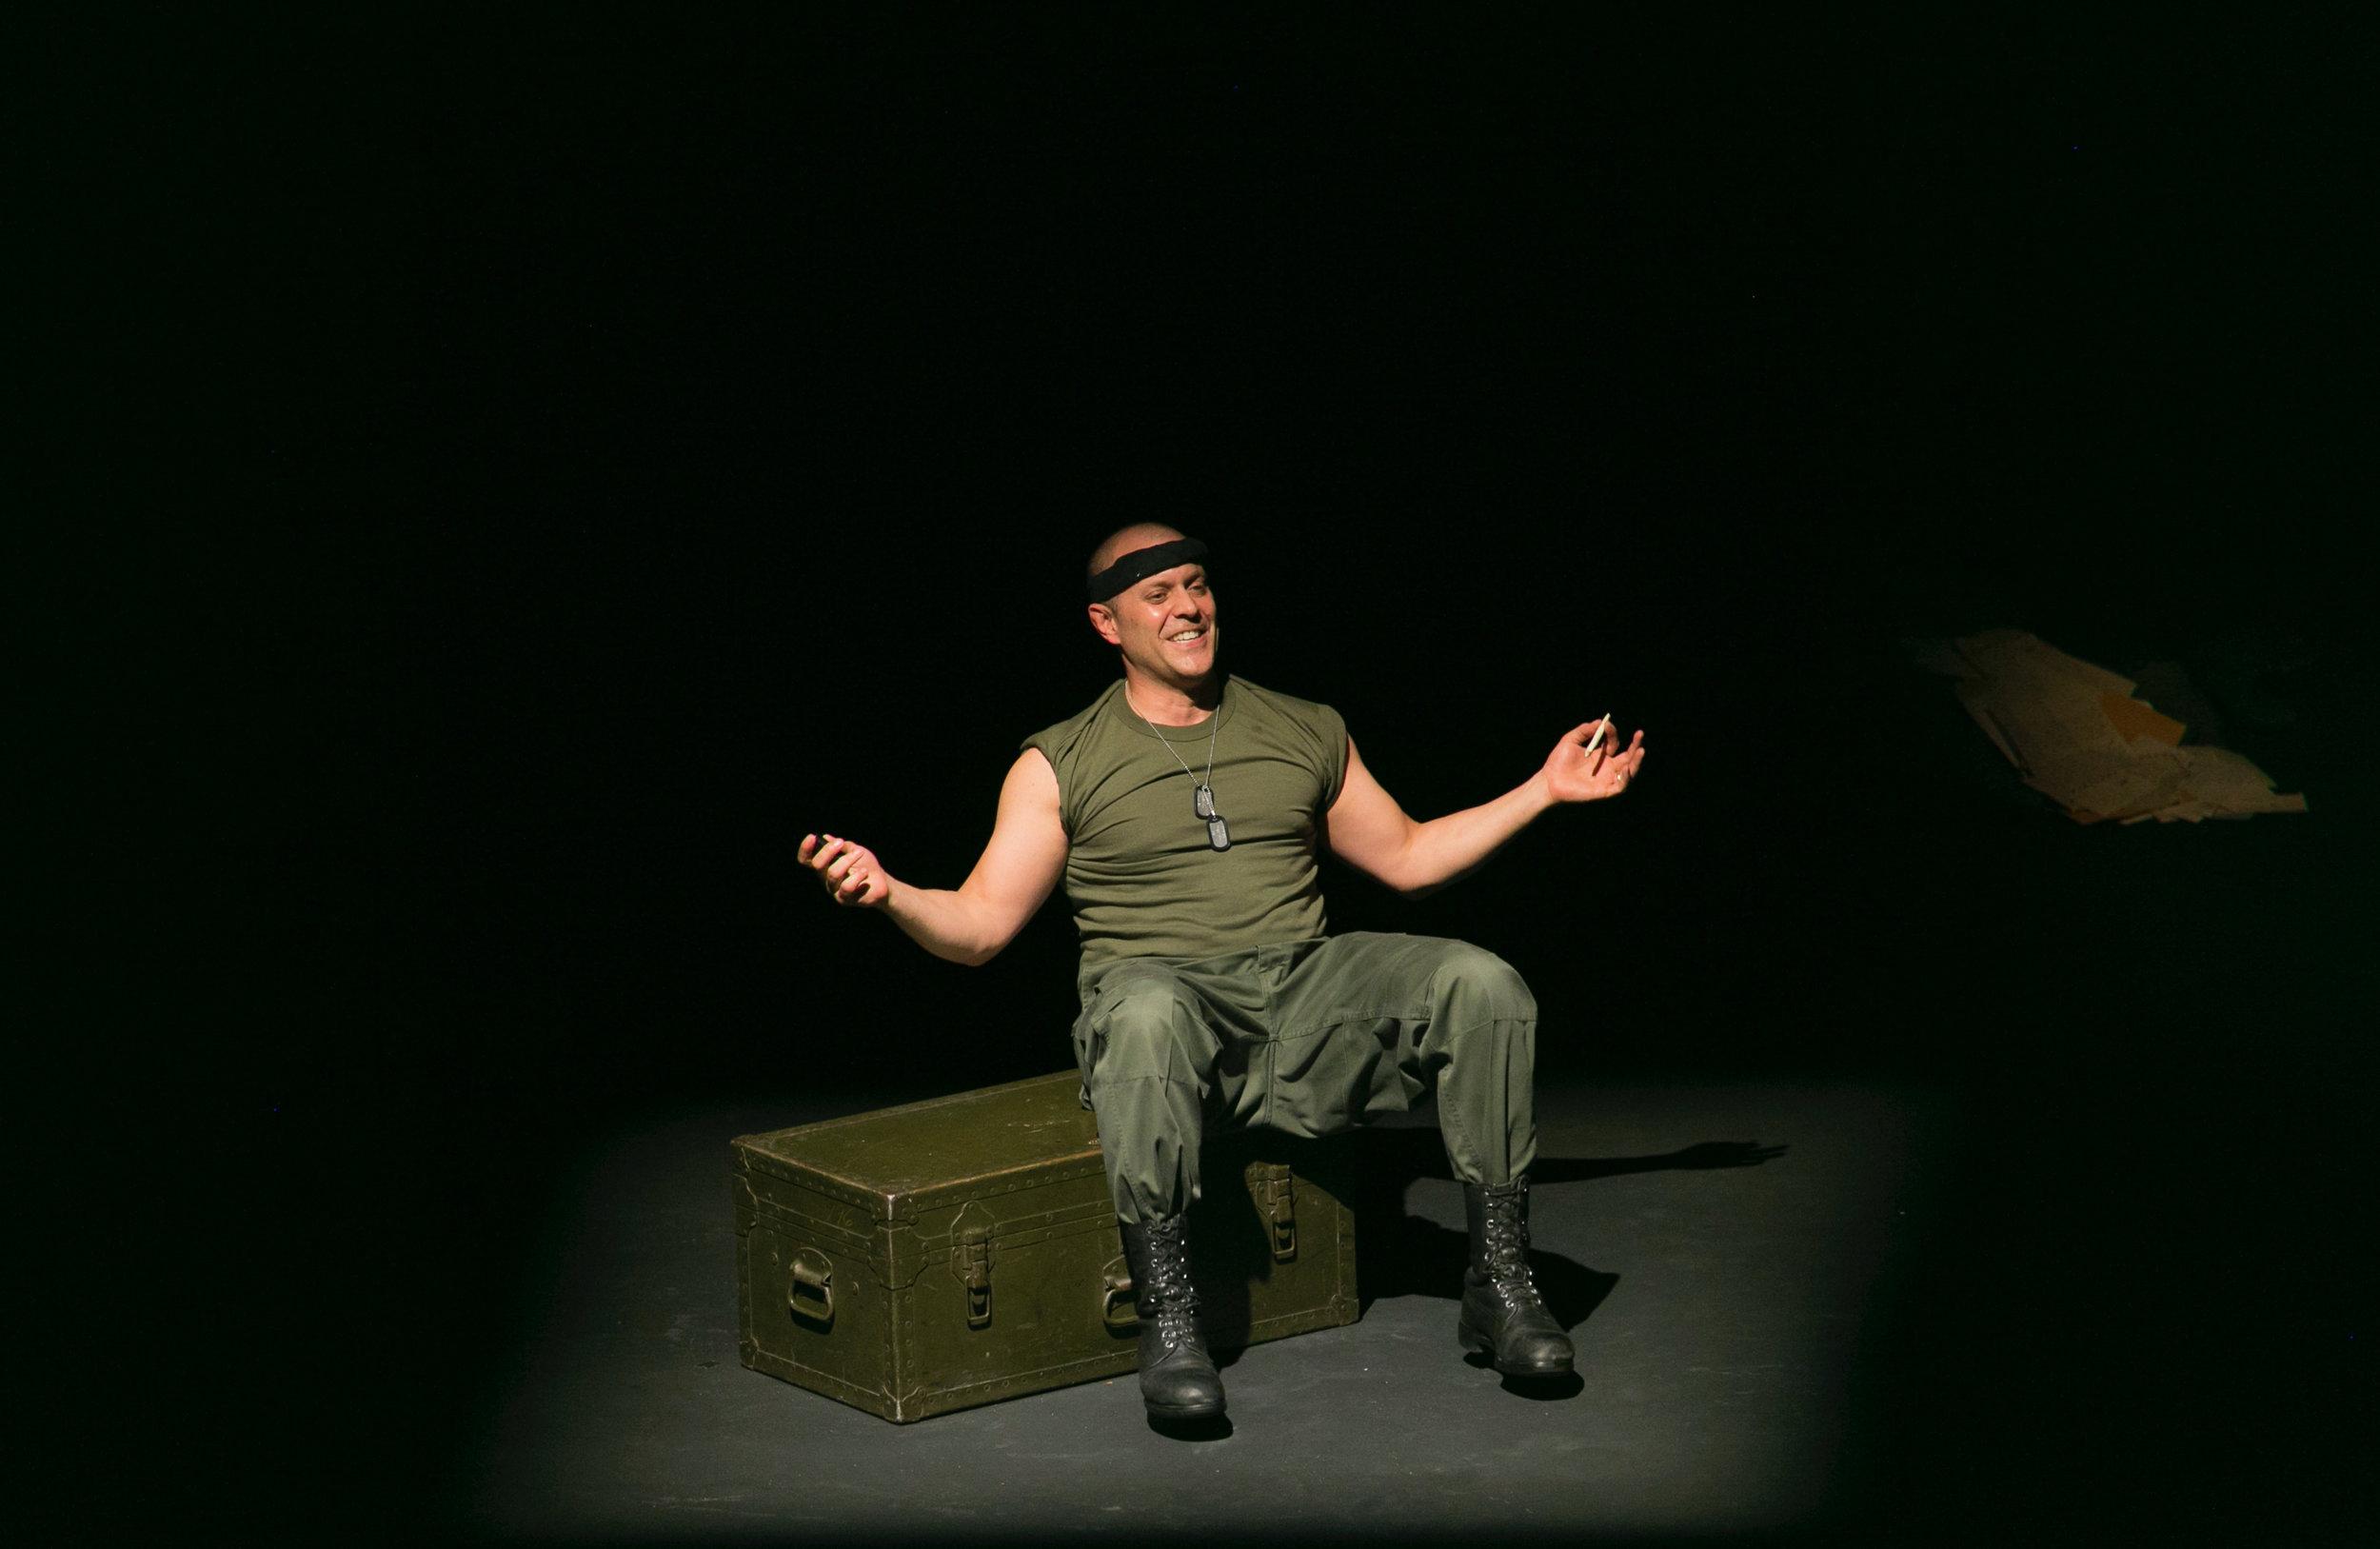 The_American_Soldier_20181005_TColella_HR_19.jpg